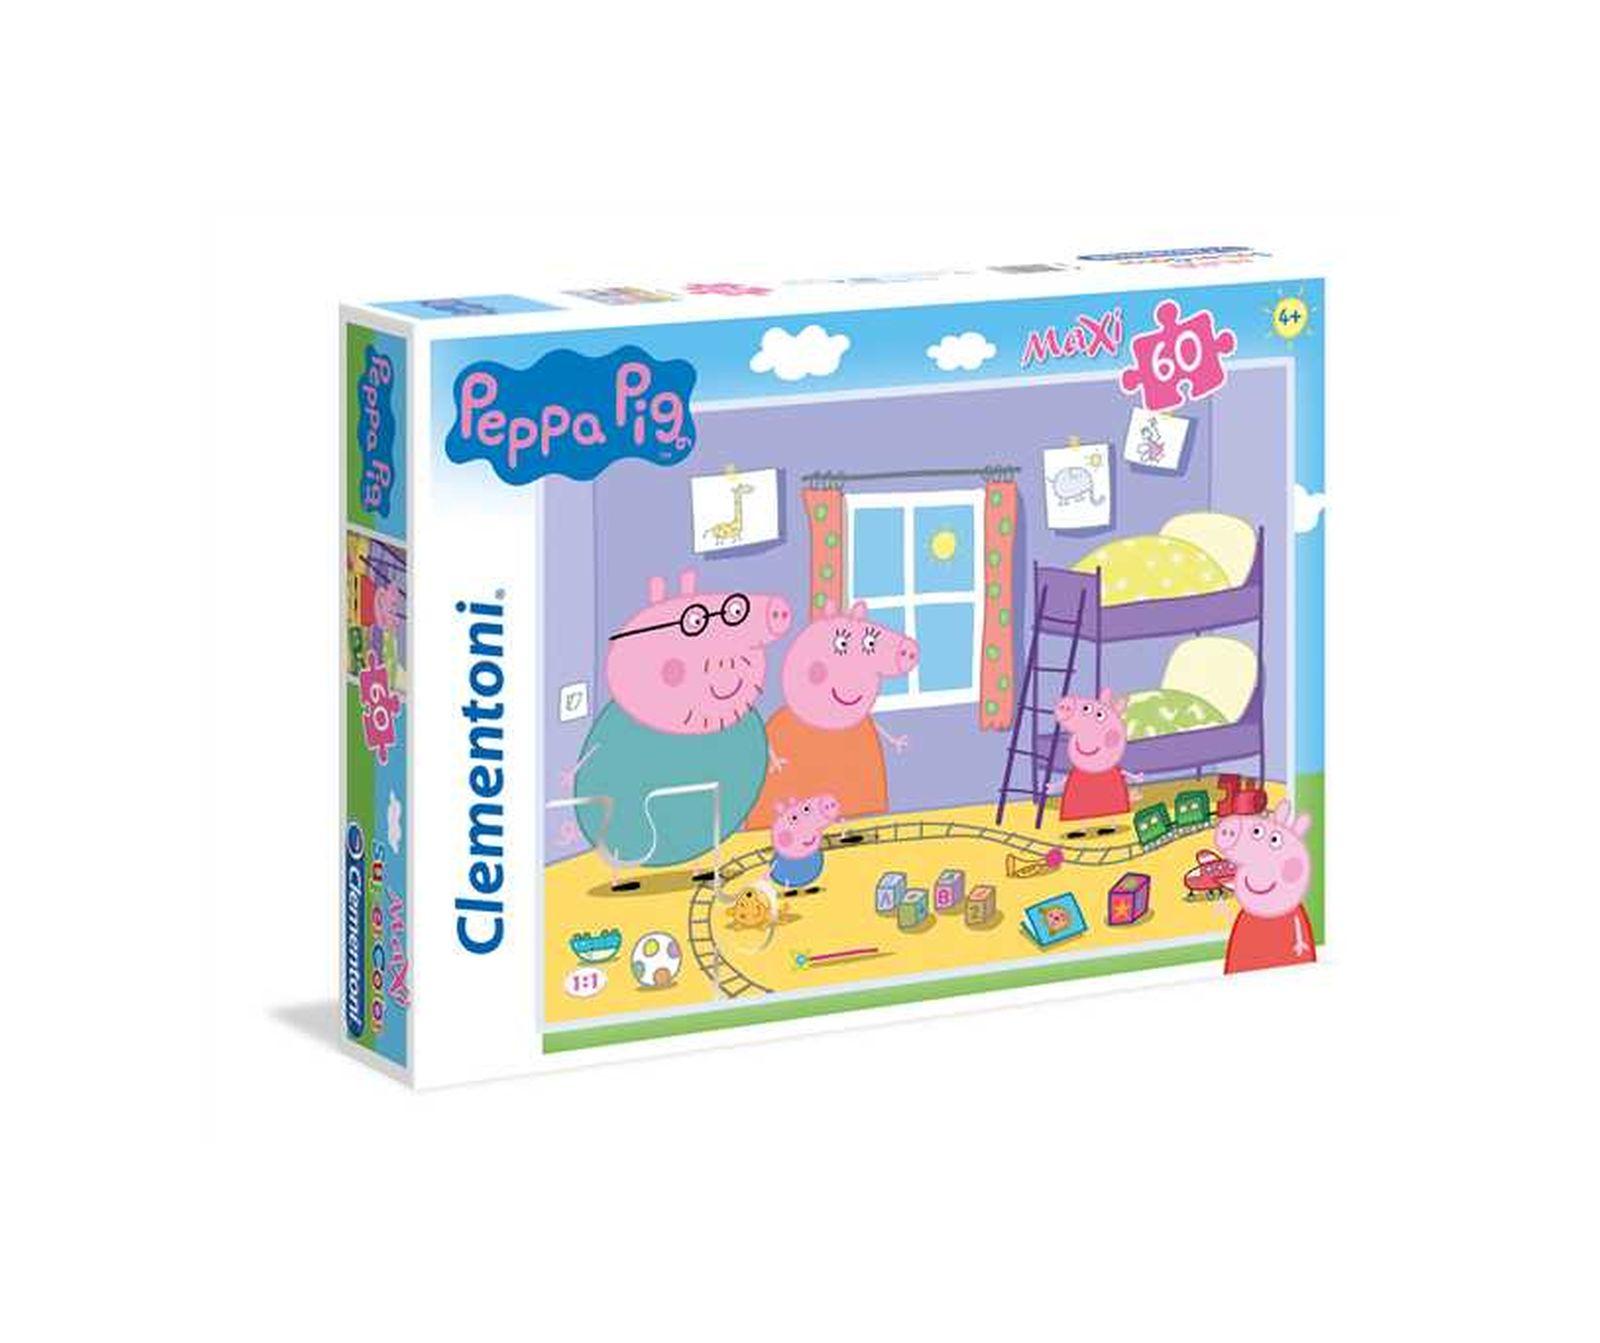 Clementoni - 26438 - supercolor puzzle - peppa pig - 60 maxi pezzi -